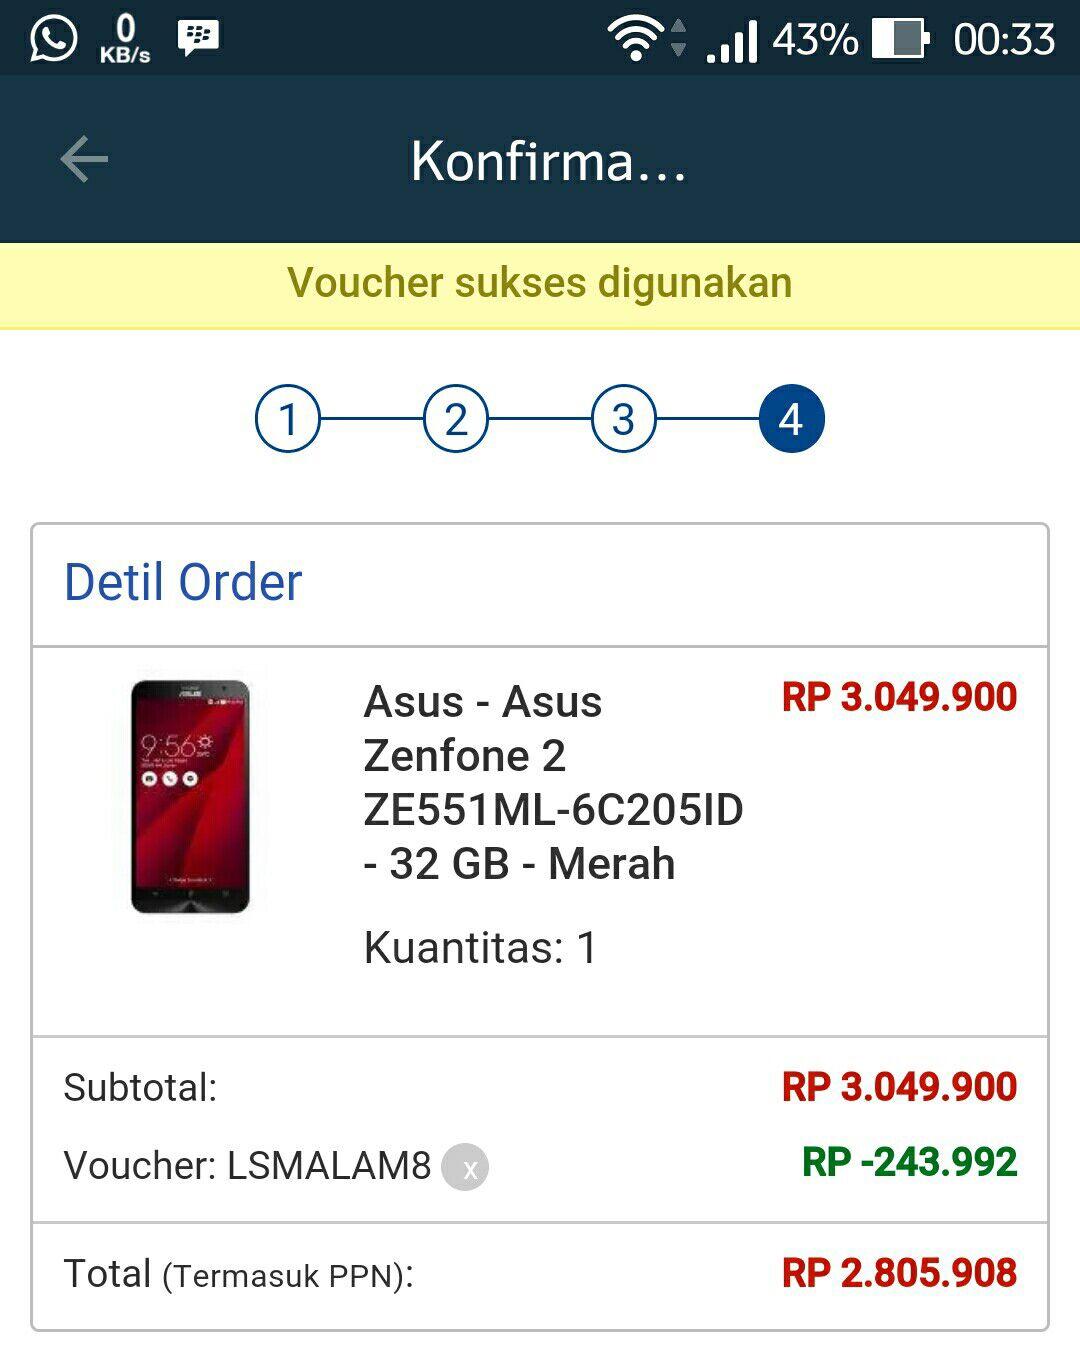 Harga ASUS ZenFone 2 Lazada September 2015